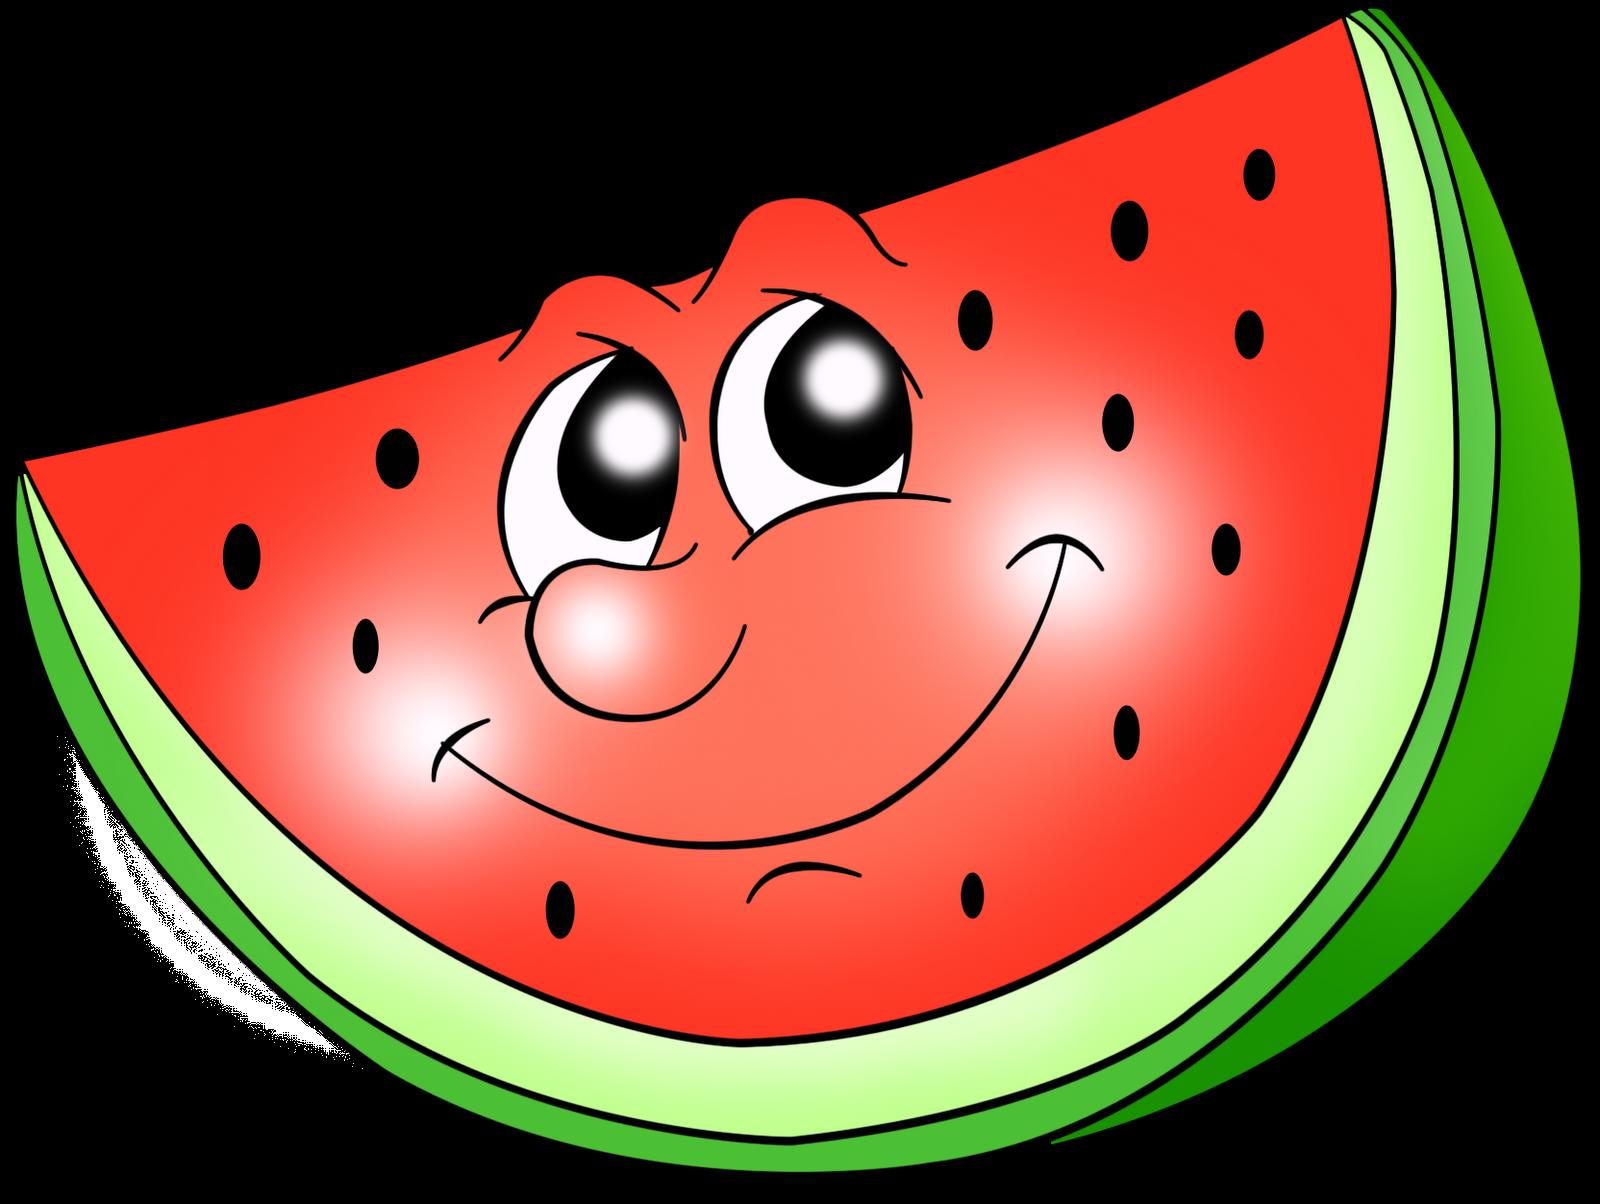 Animation stock photography clip. Watermelon clipart cucumber melon